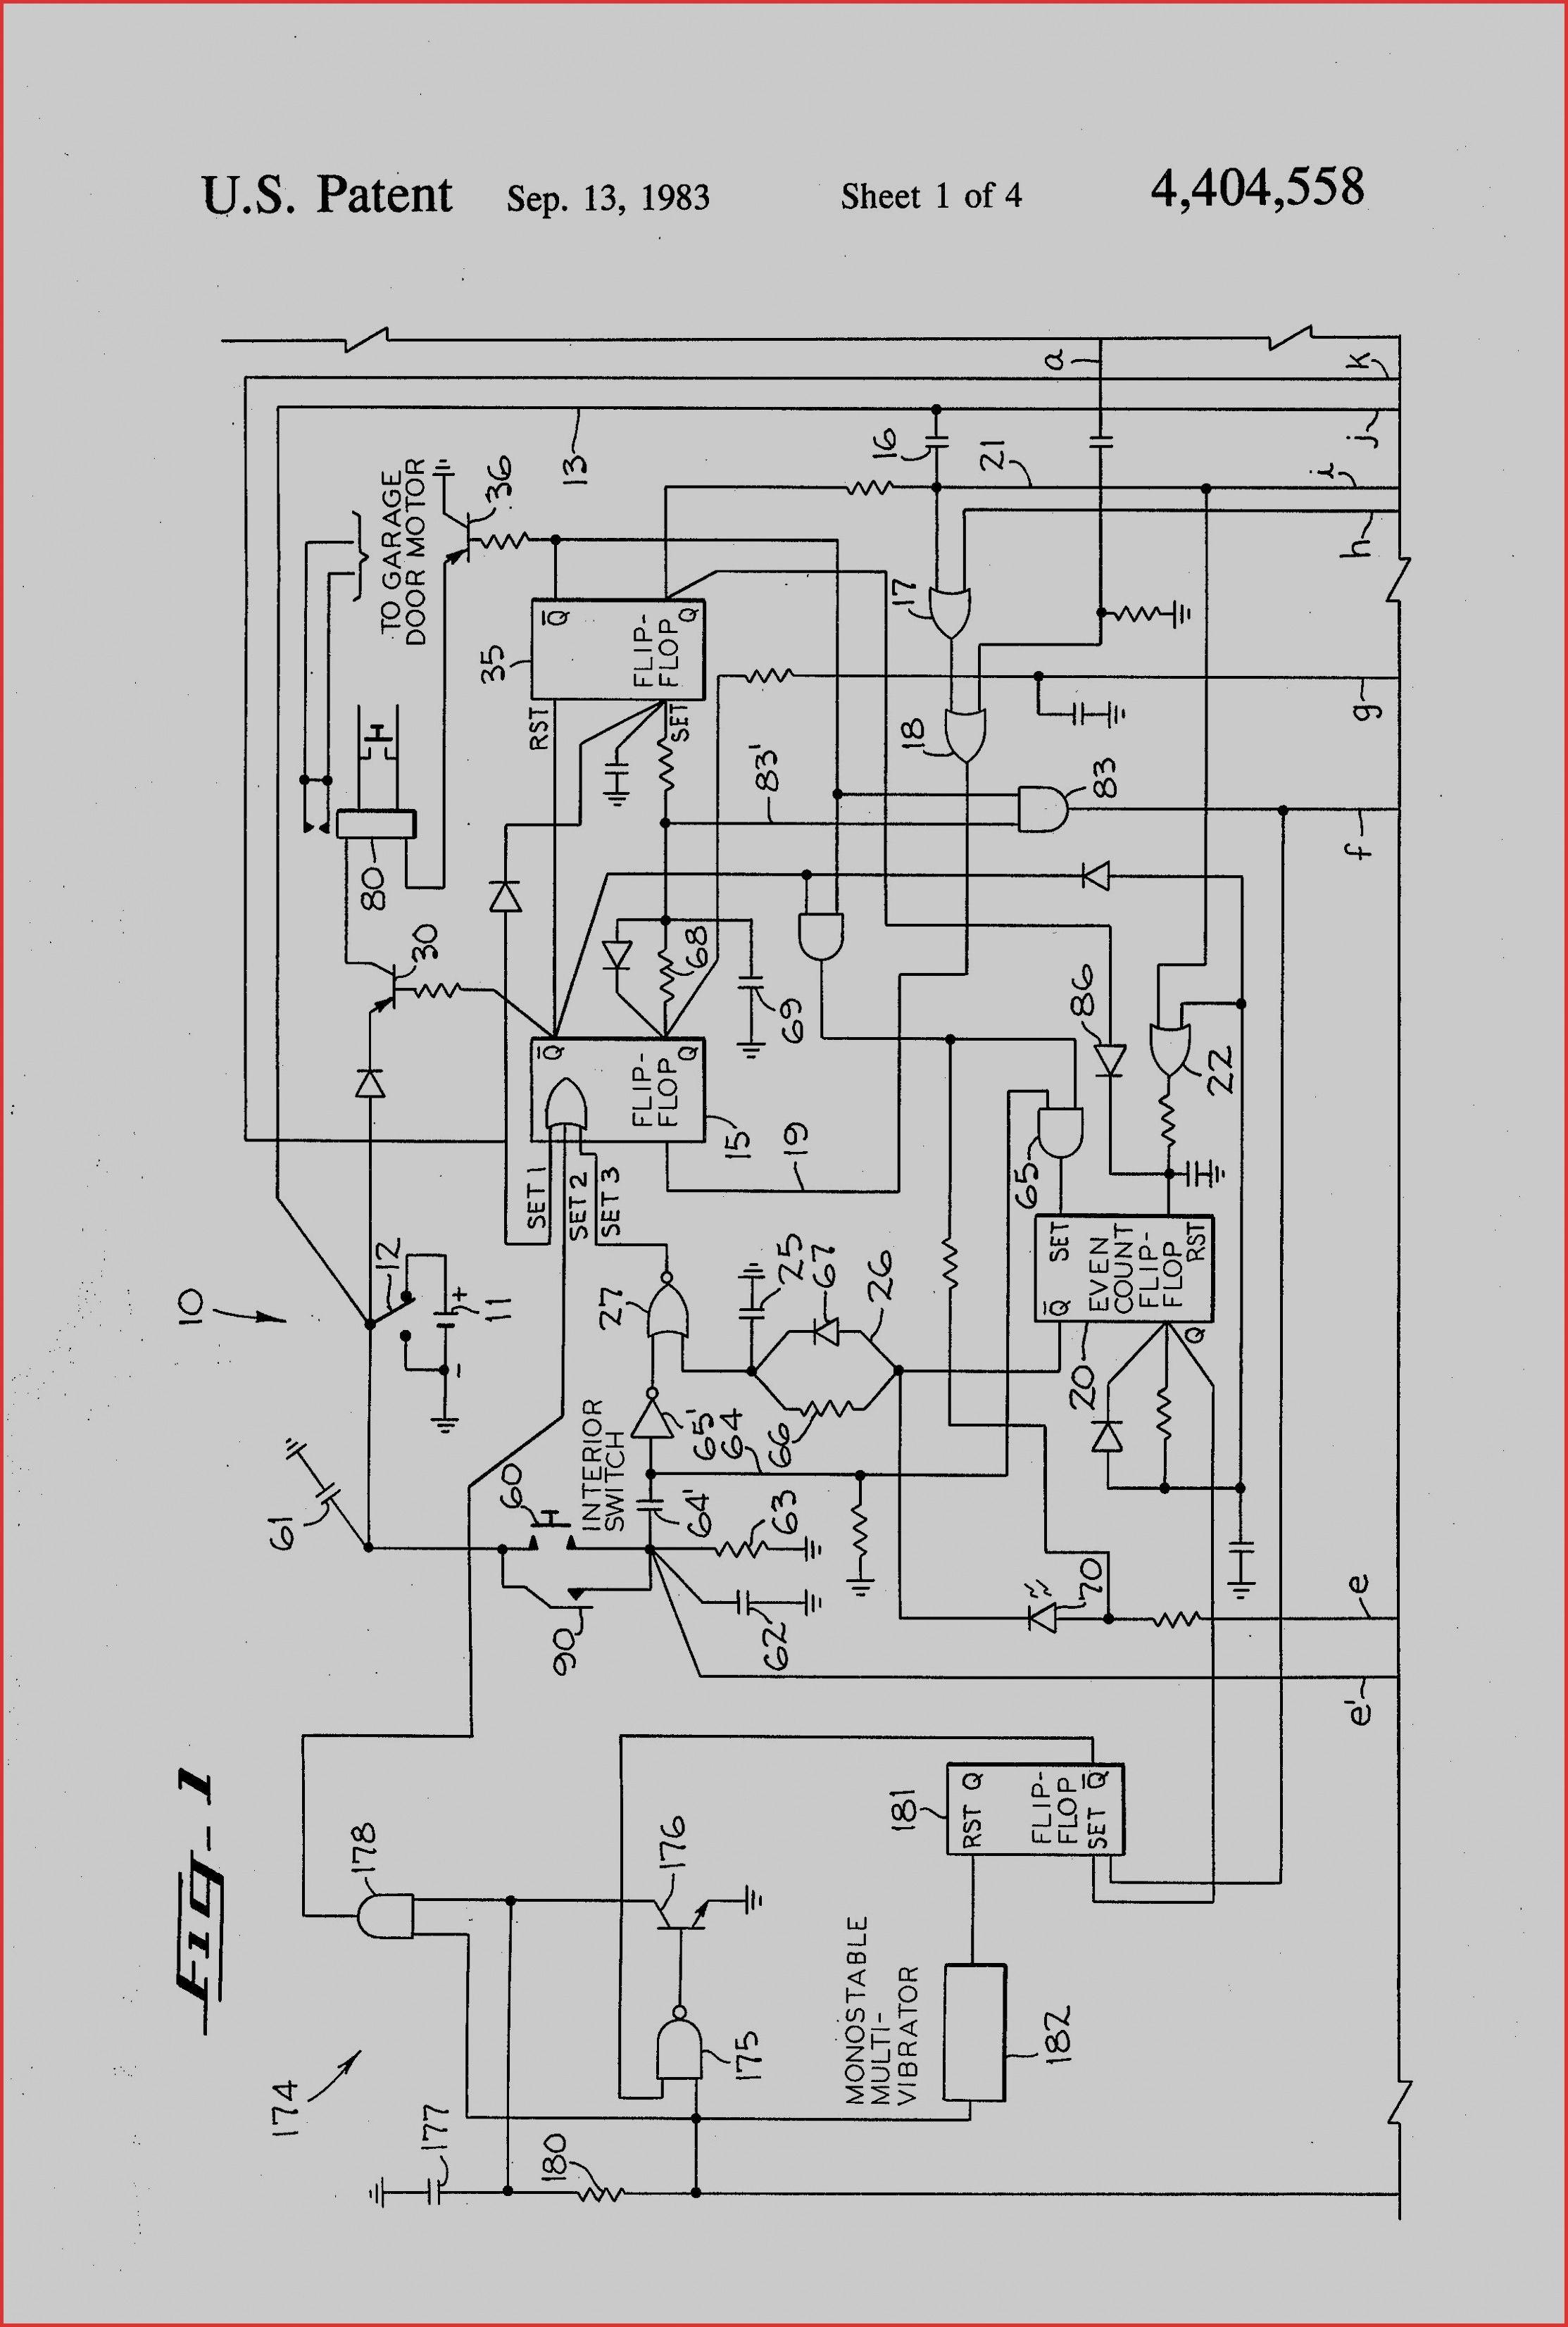 genie garage door openers sensor wiring diagrams unique wiring diagram electric gates  with images  genie garage  unique wiring diagram electric gates